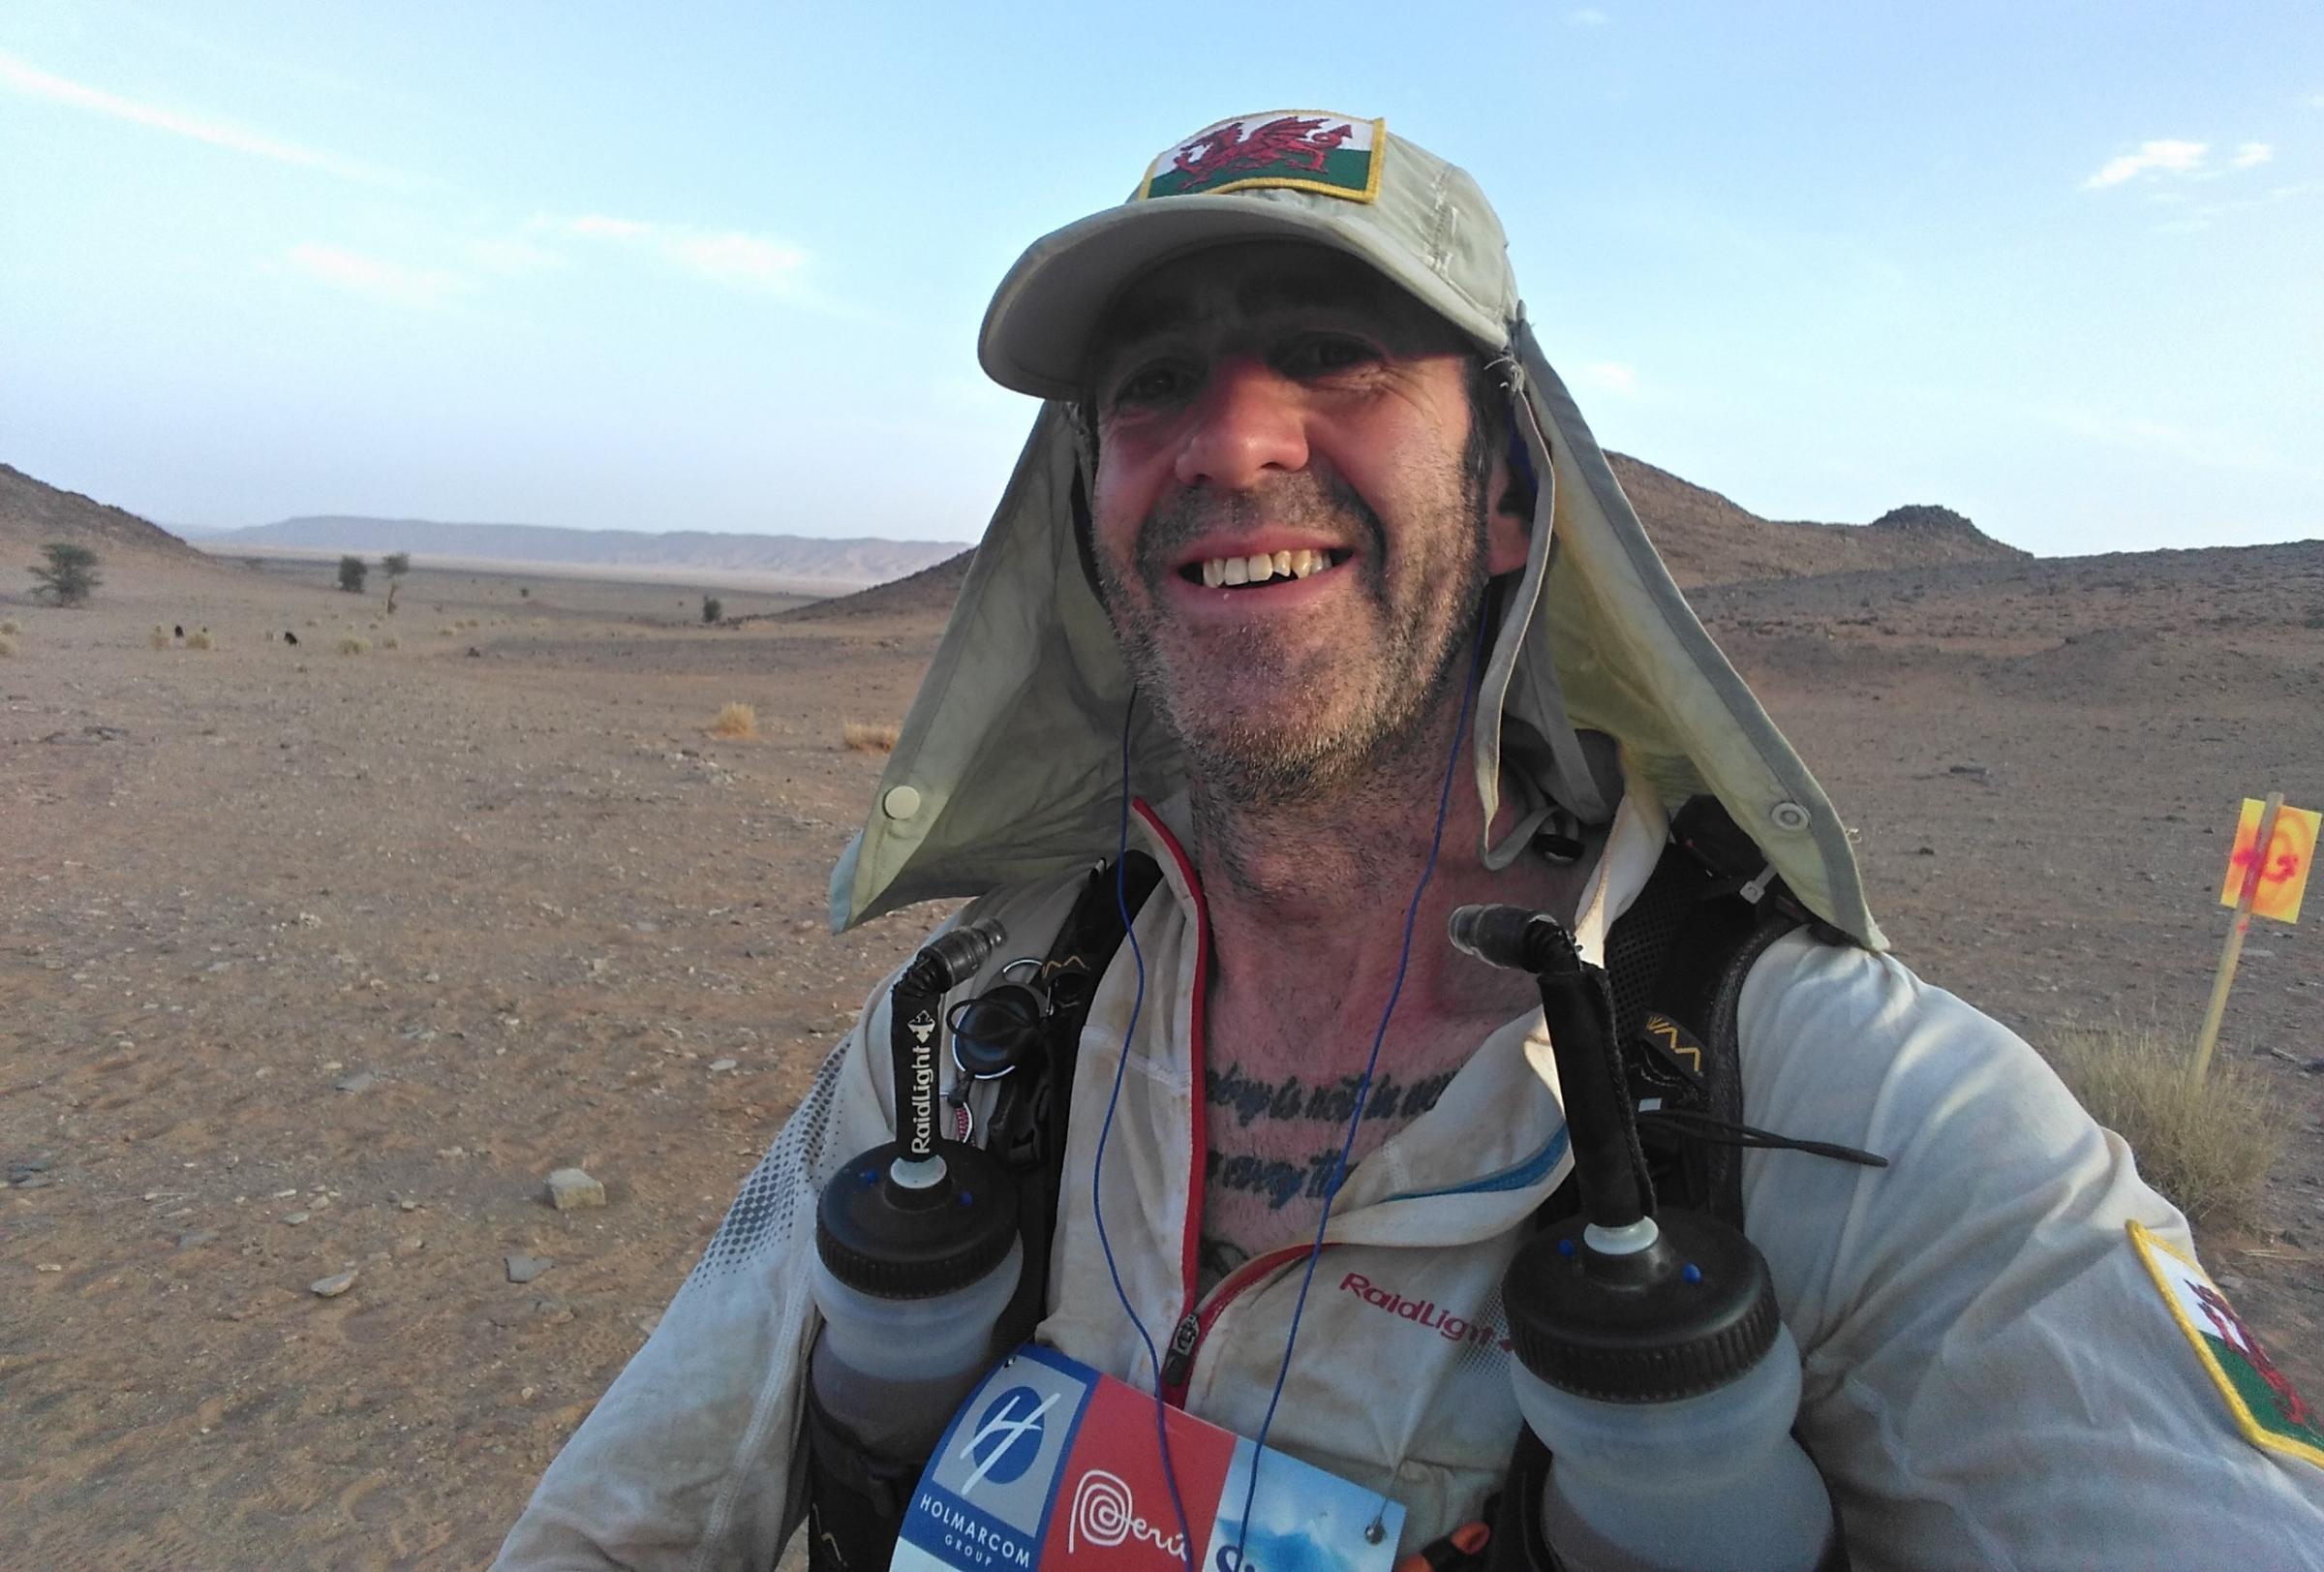 Wrexham runner to take part in Grand Ultra-Marathon in Arizona